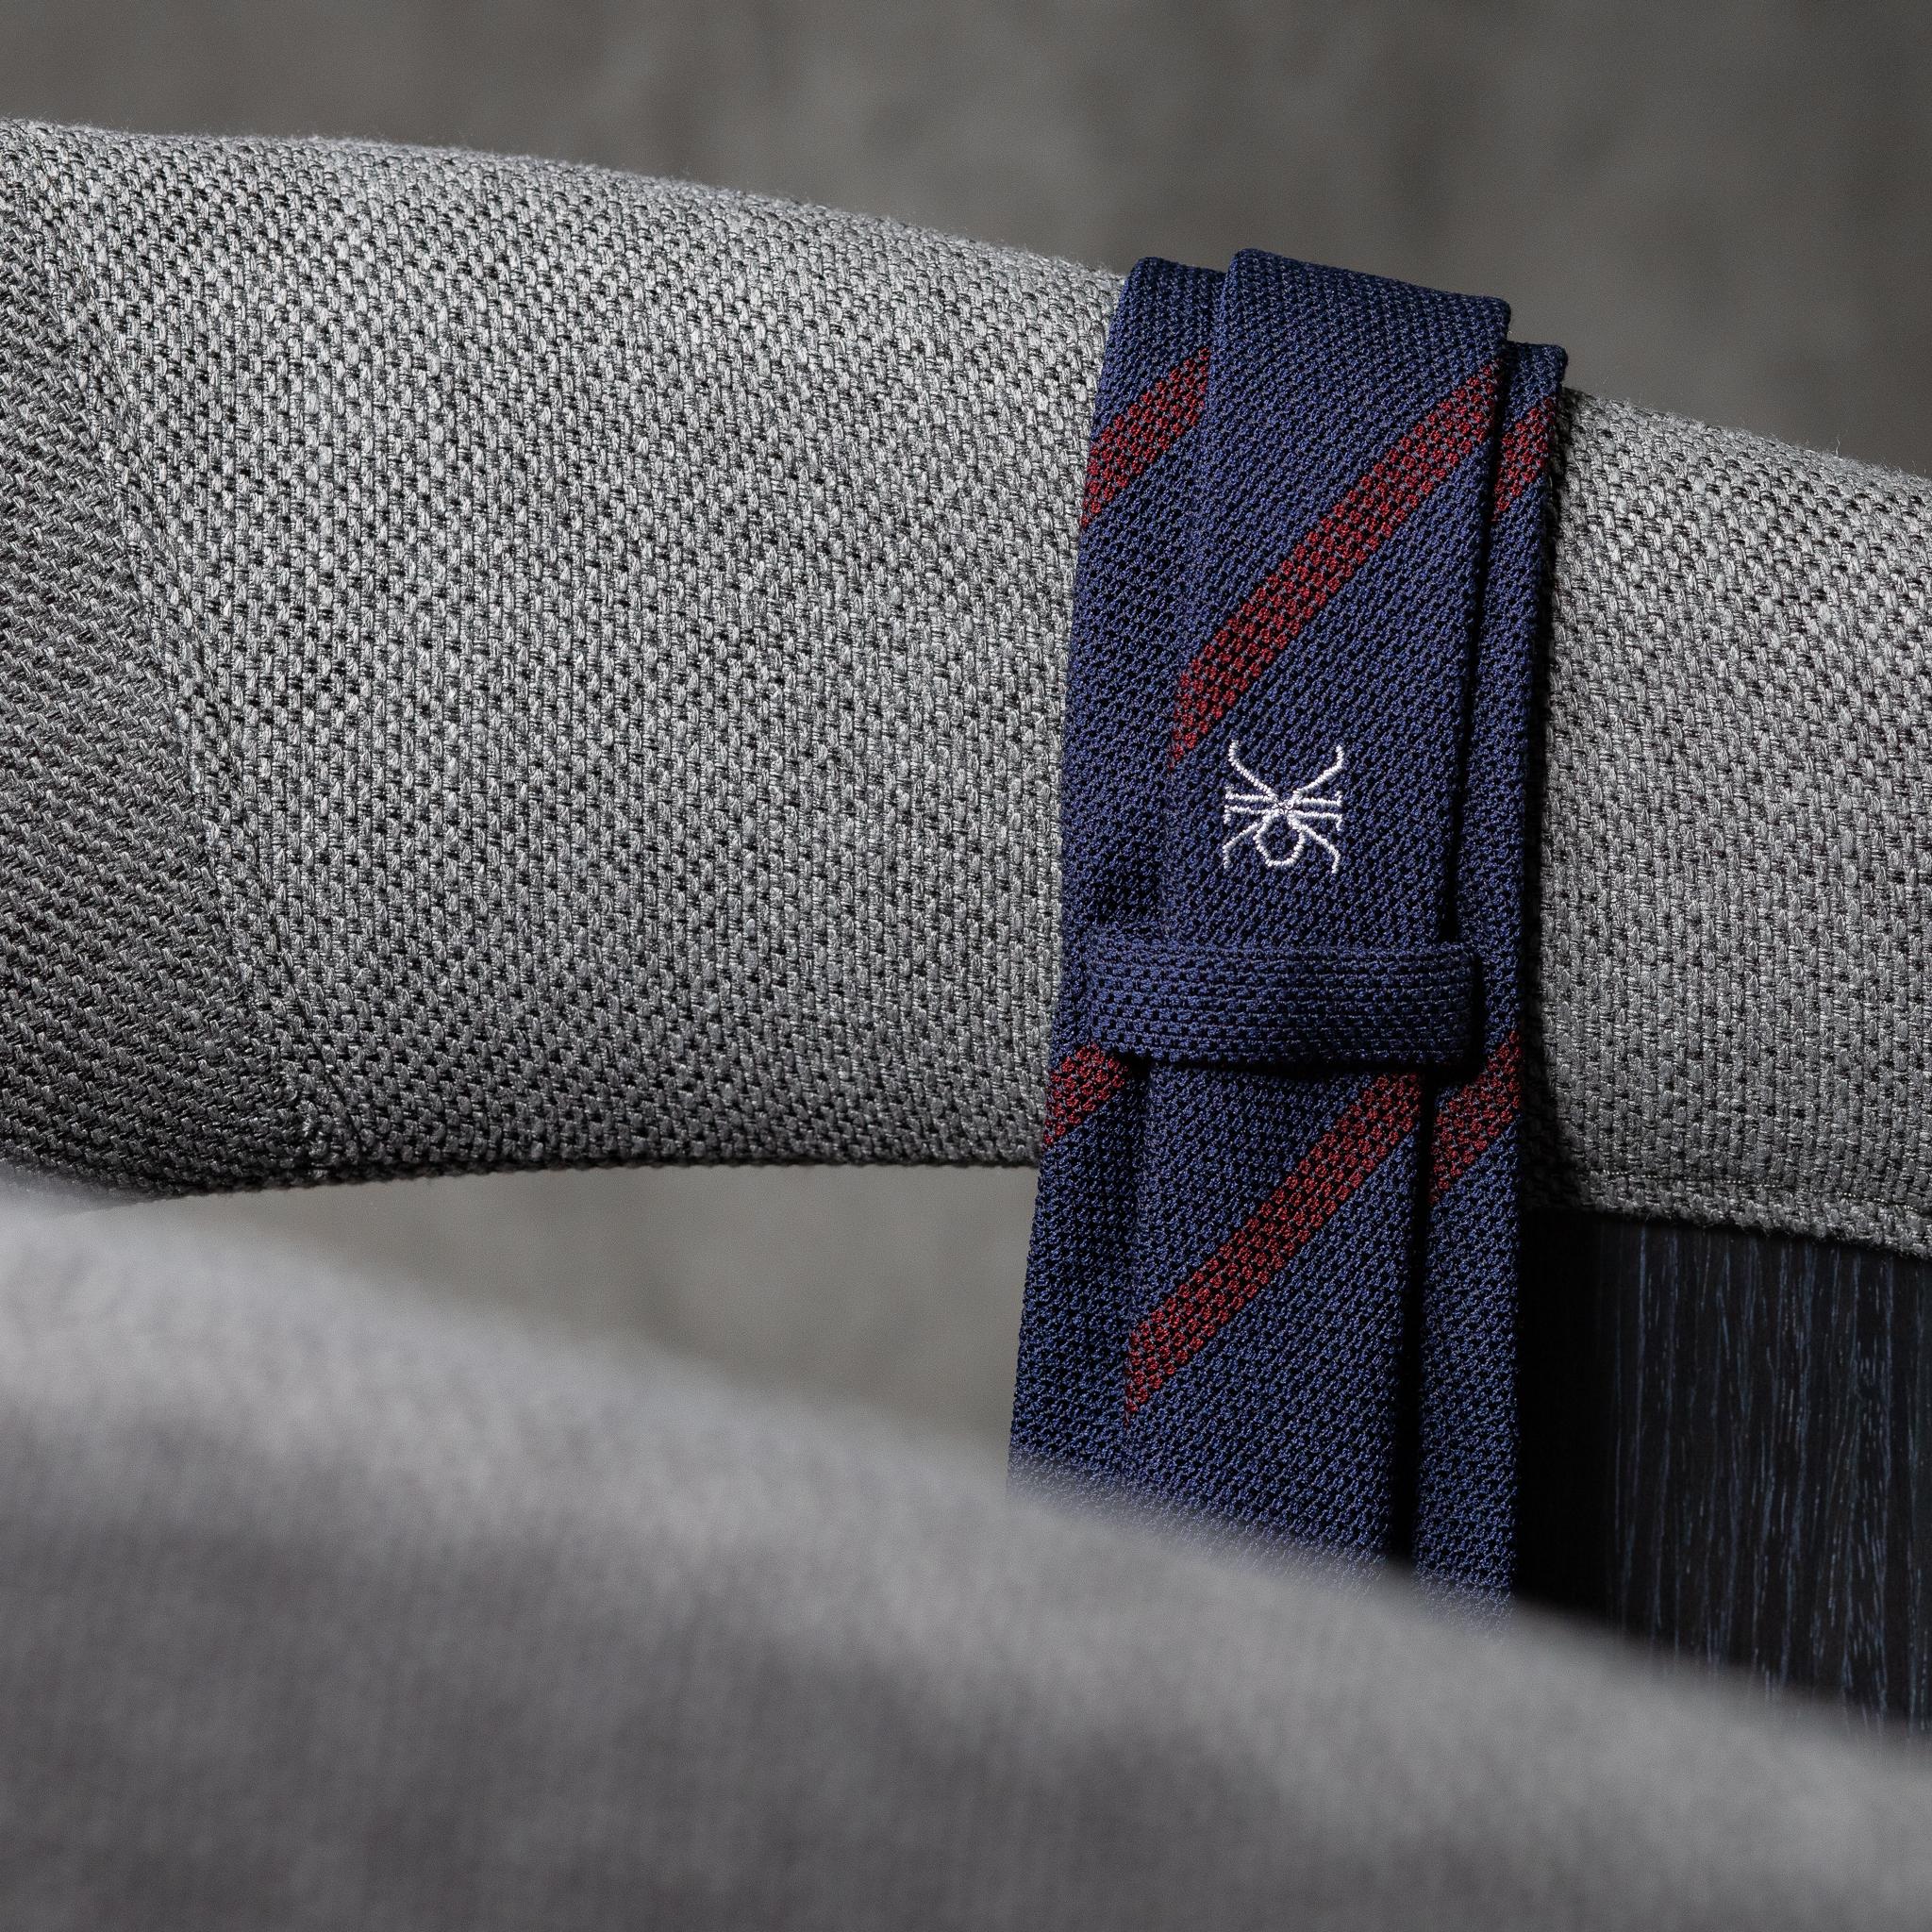 BOUCLÉ-0535-Tie-Initials-Corbata-Iniciales-The-Seelk-3